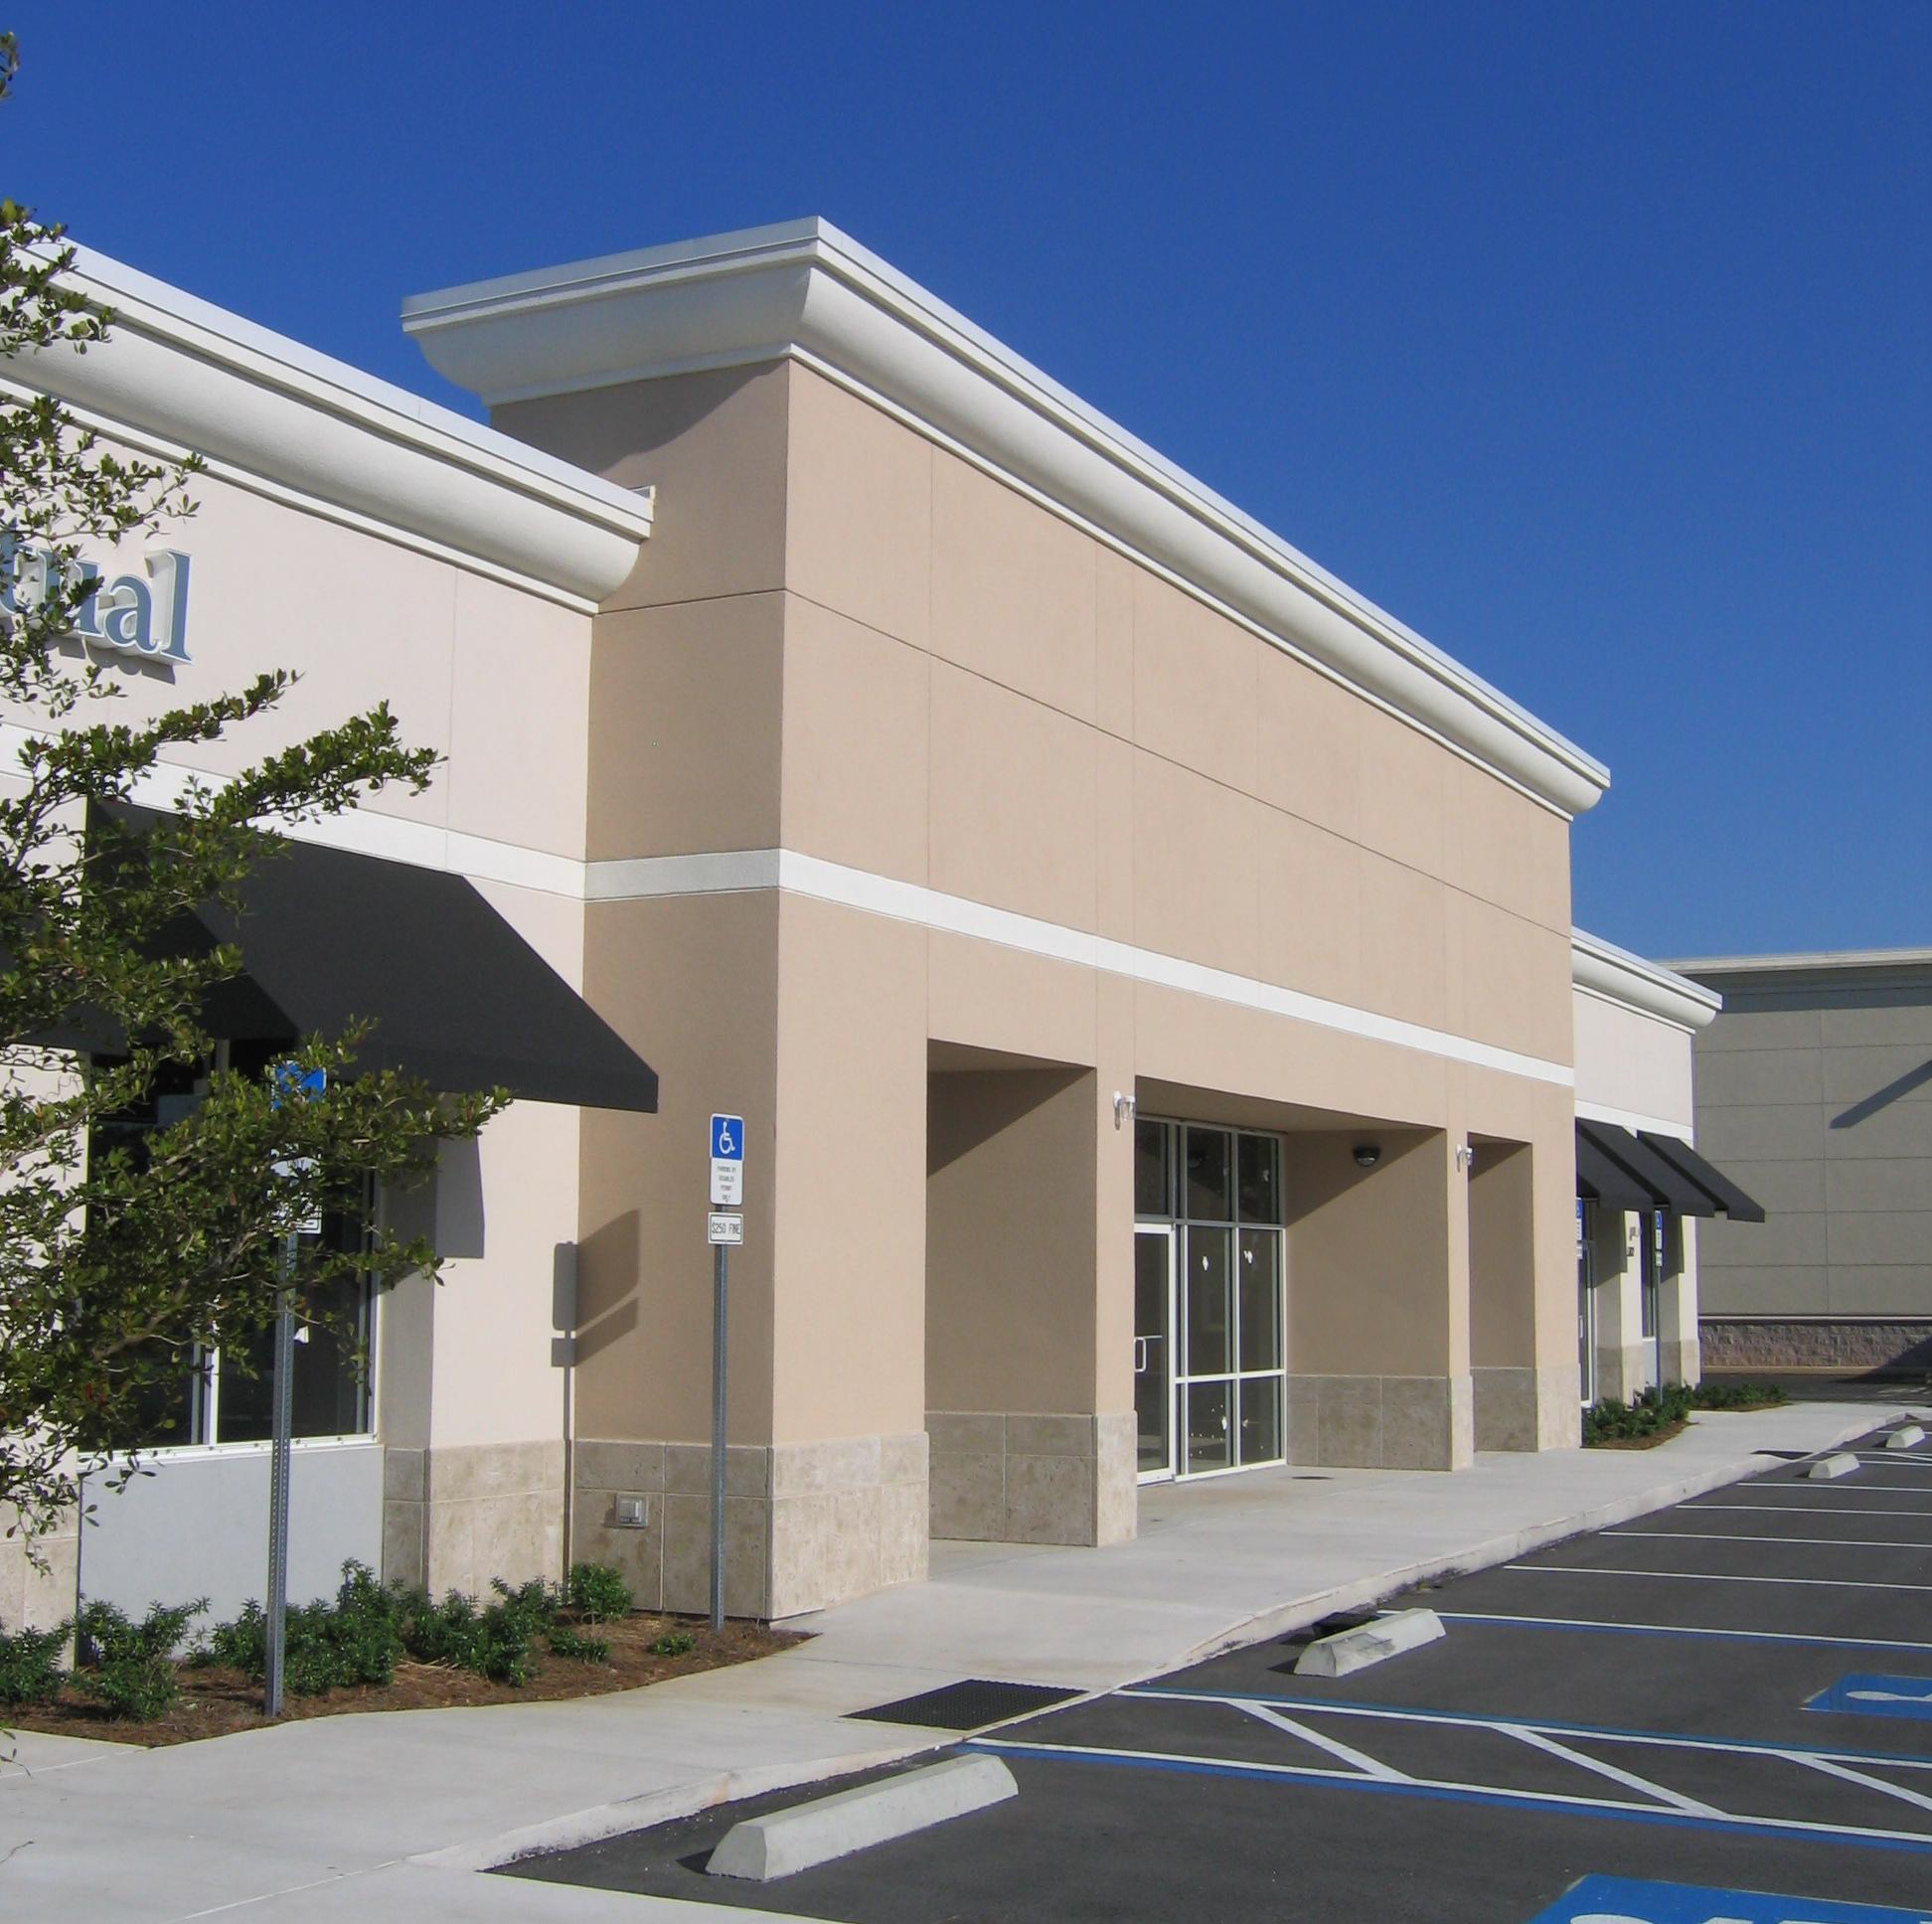 Centergate Office Building